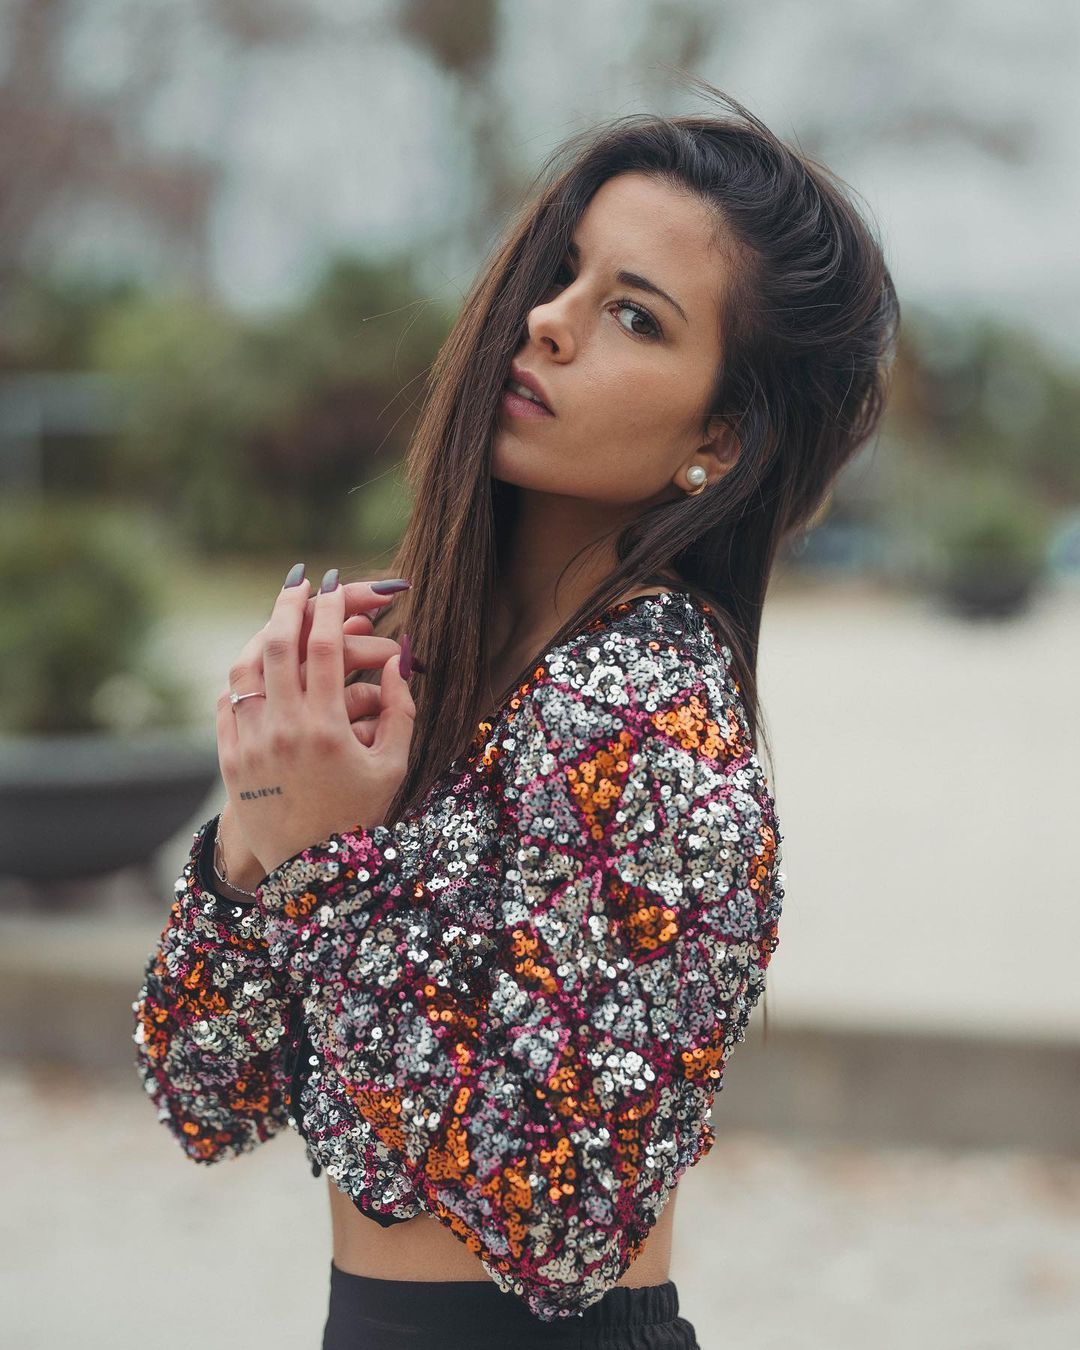 Alba-Lopez-Wallpapers-Insta-Fit-Bio-3